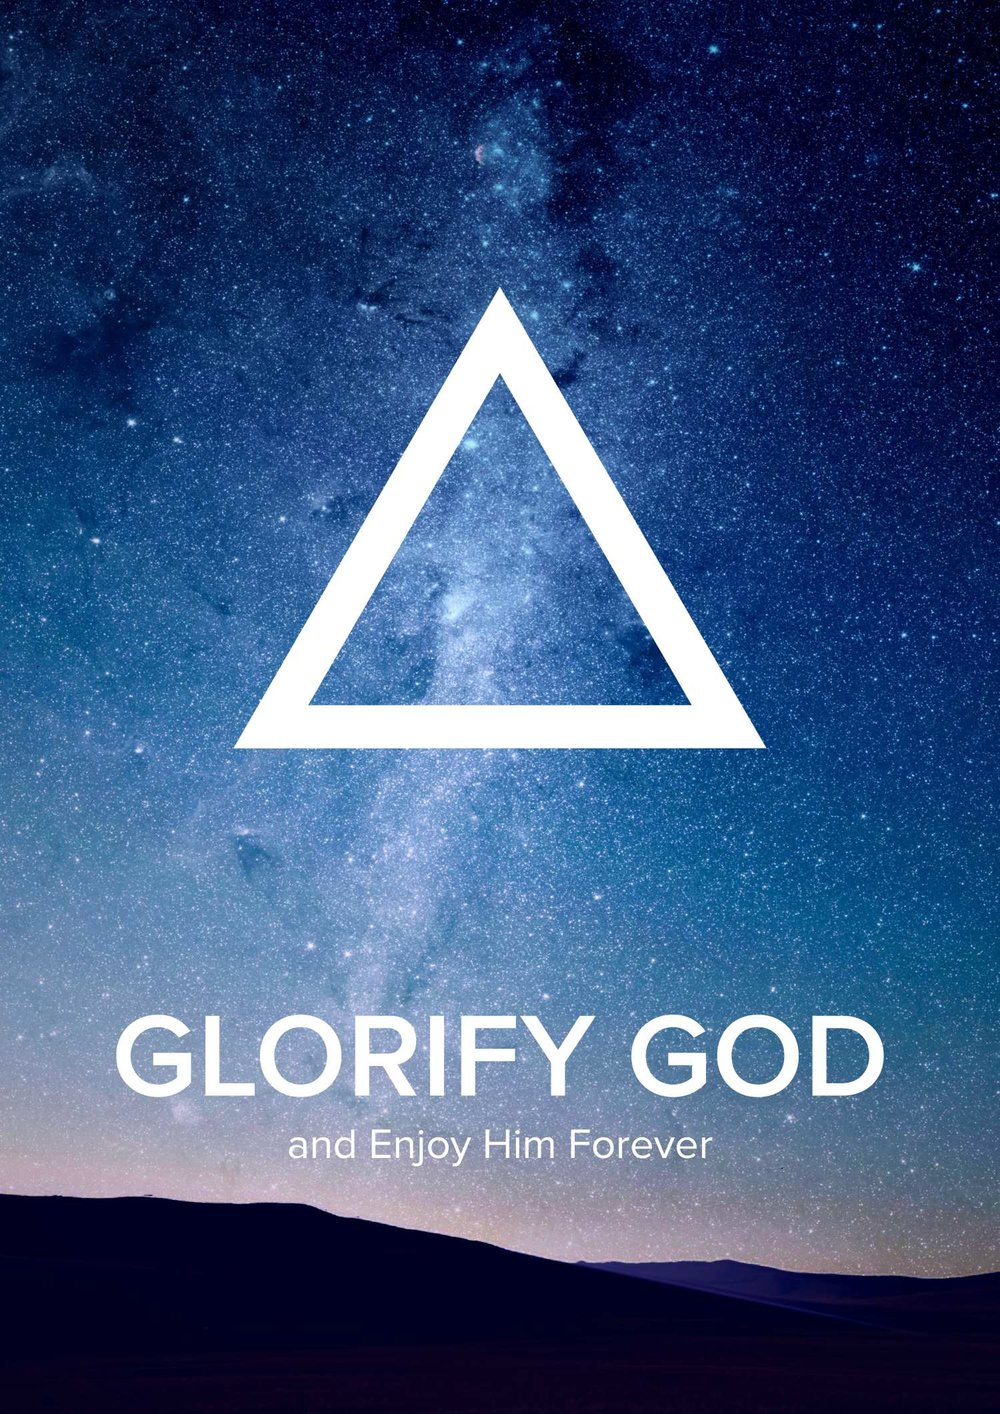 glorify_god.jpg